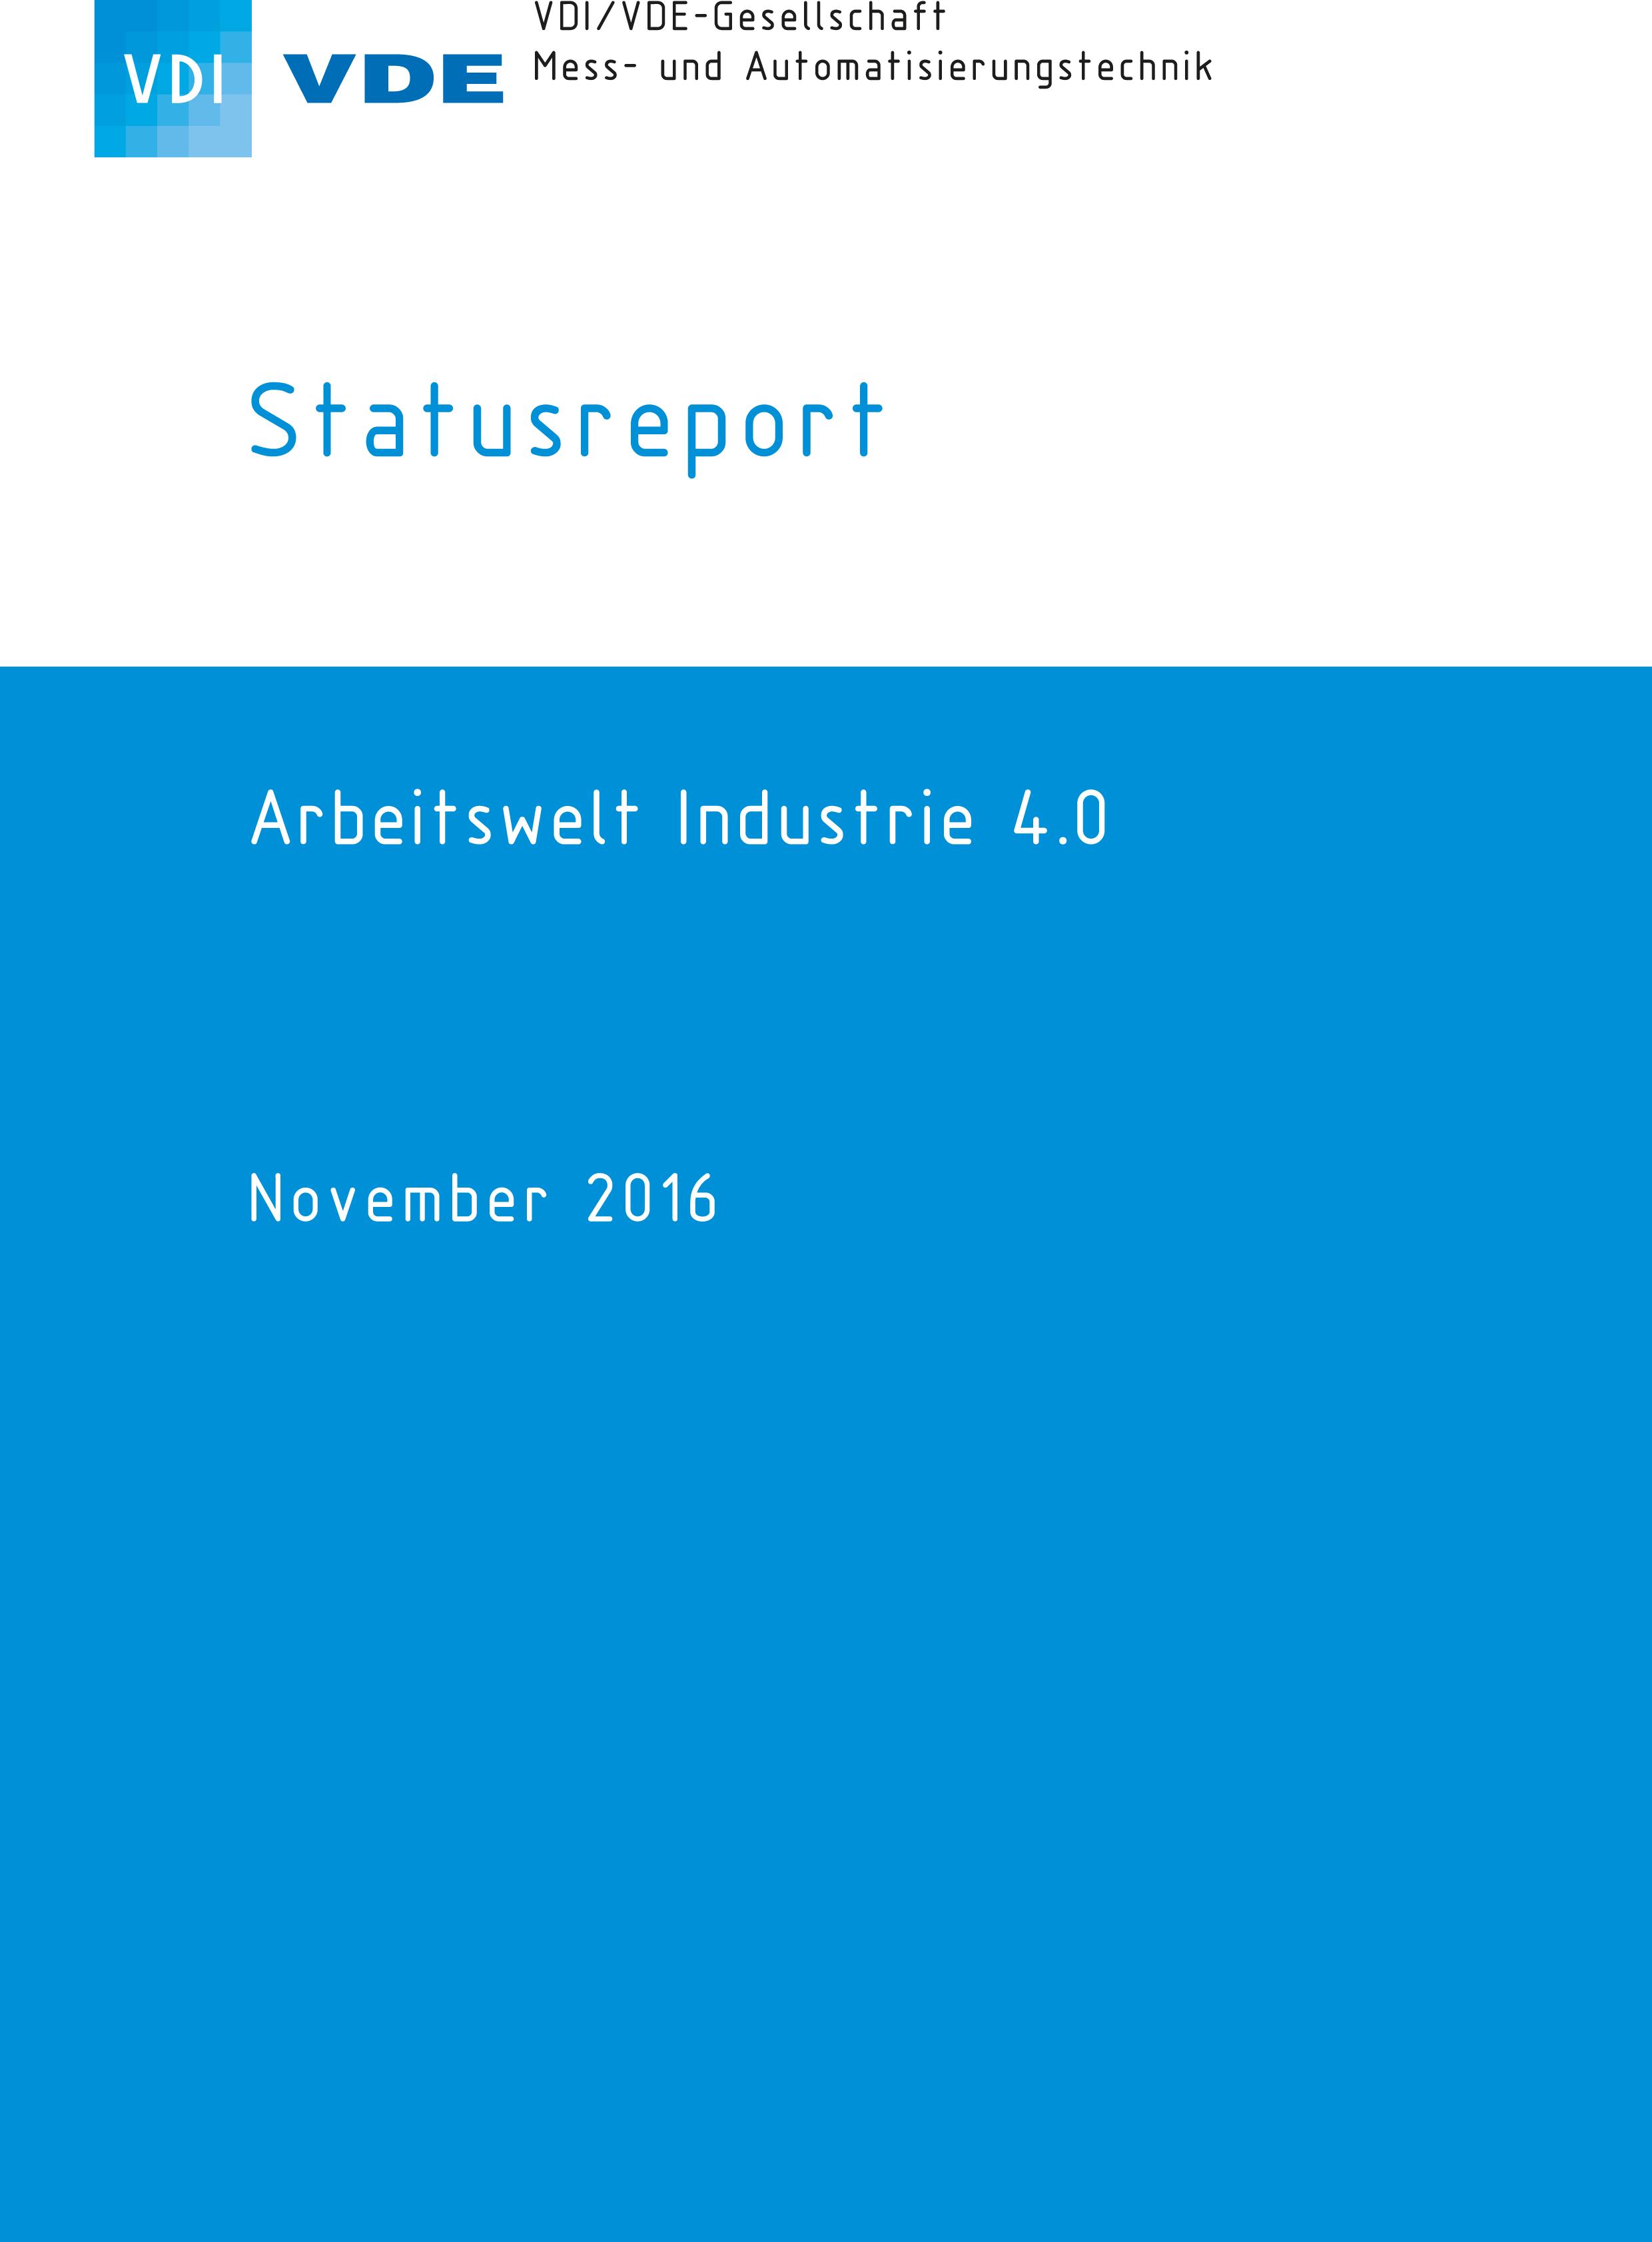 VDI-Statusreport 'Arbeitswelt Industrie 4.0'